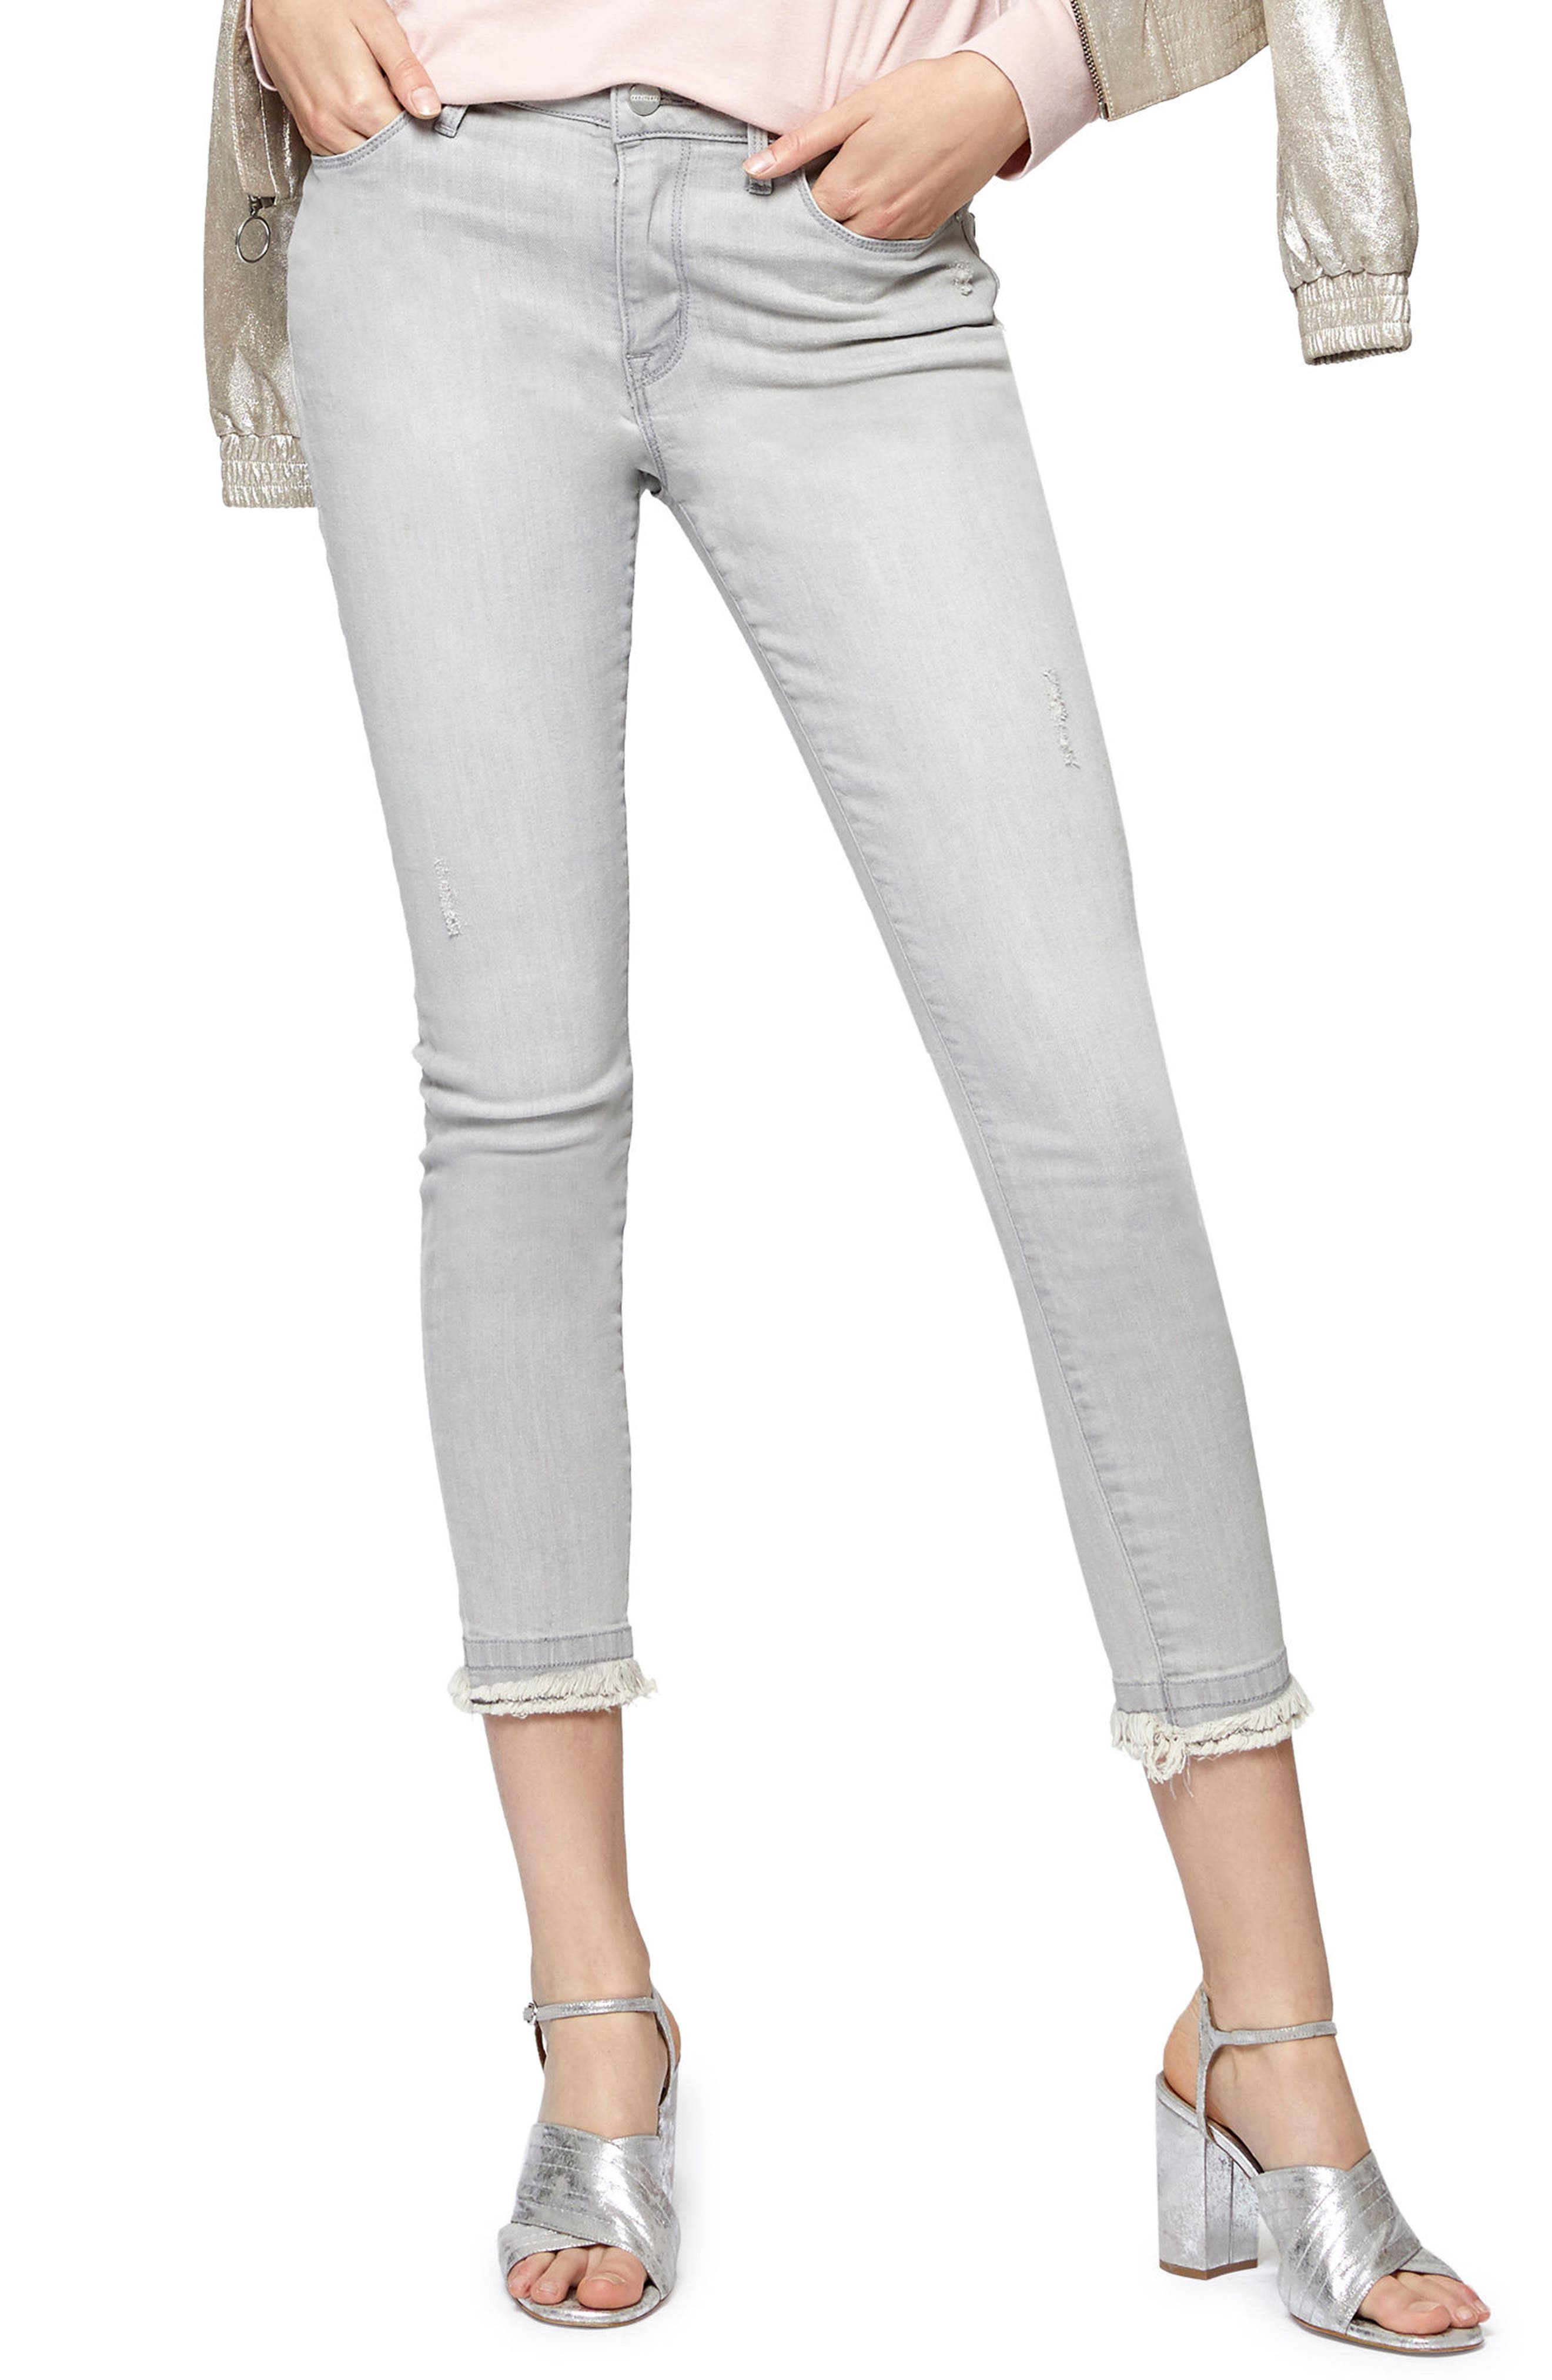 Alternate Image 3  - Sanctuary Saige Double Fray Ankle Jeans (Greyson)